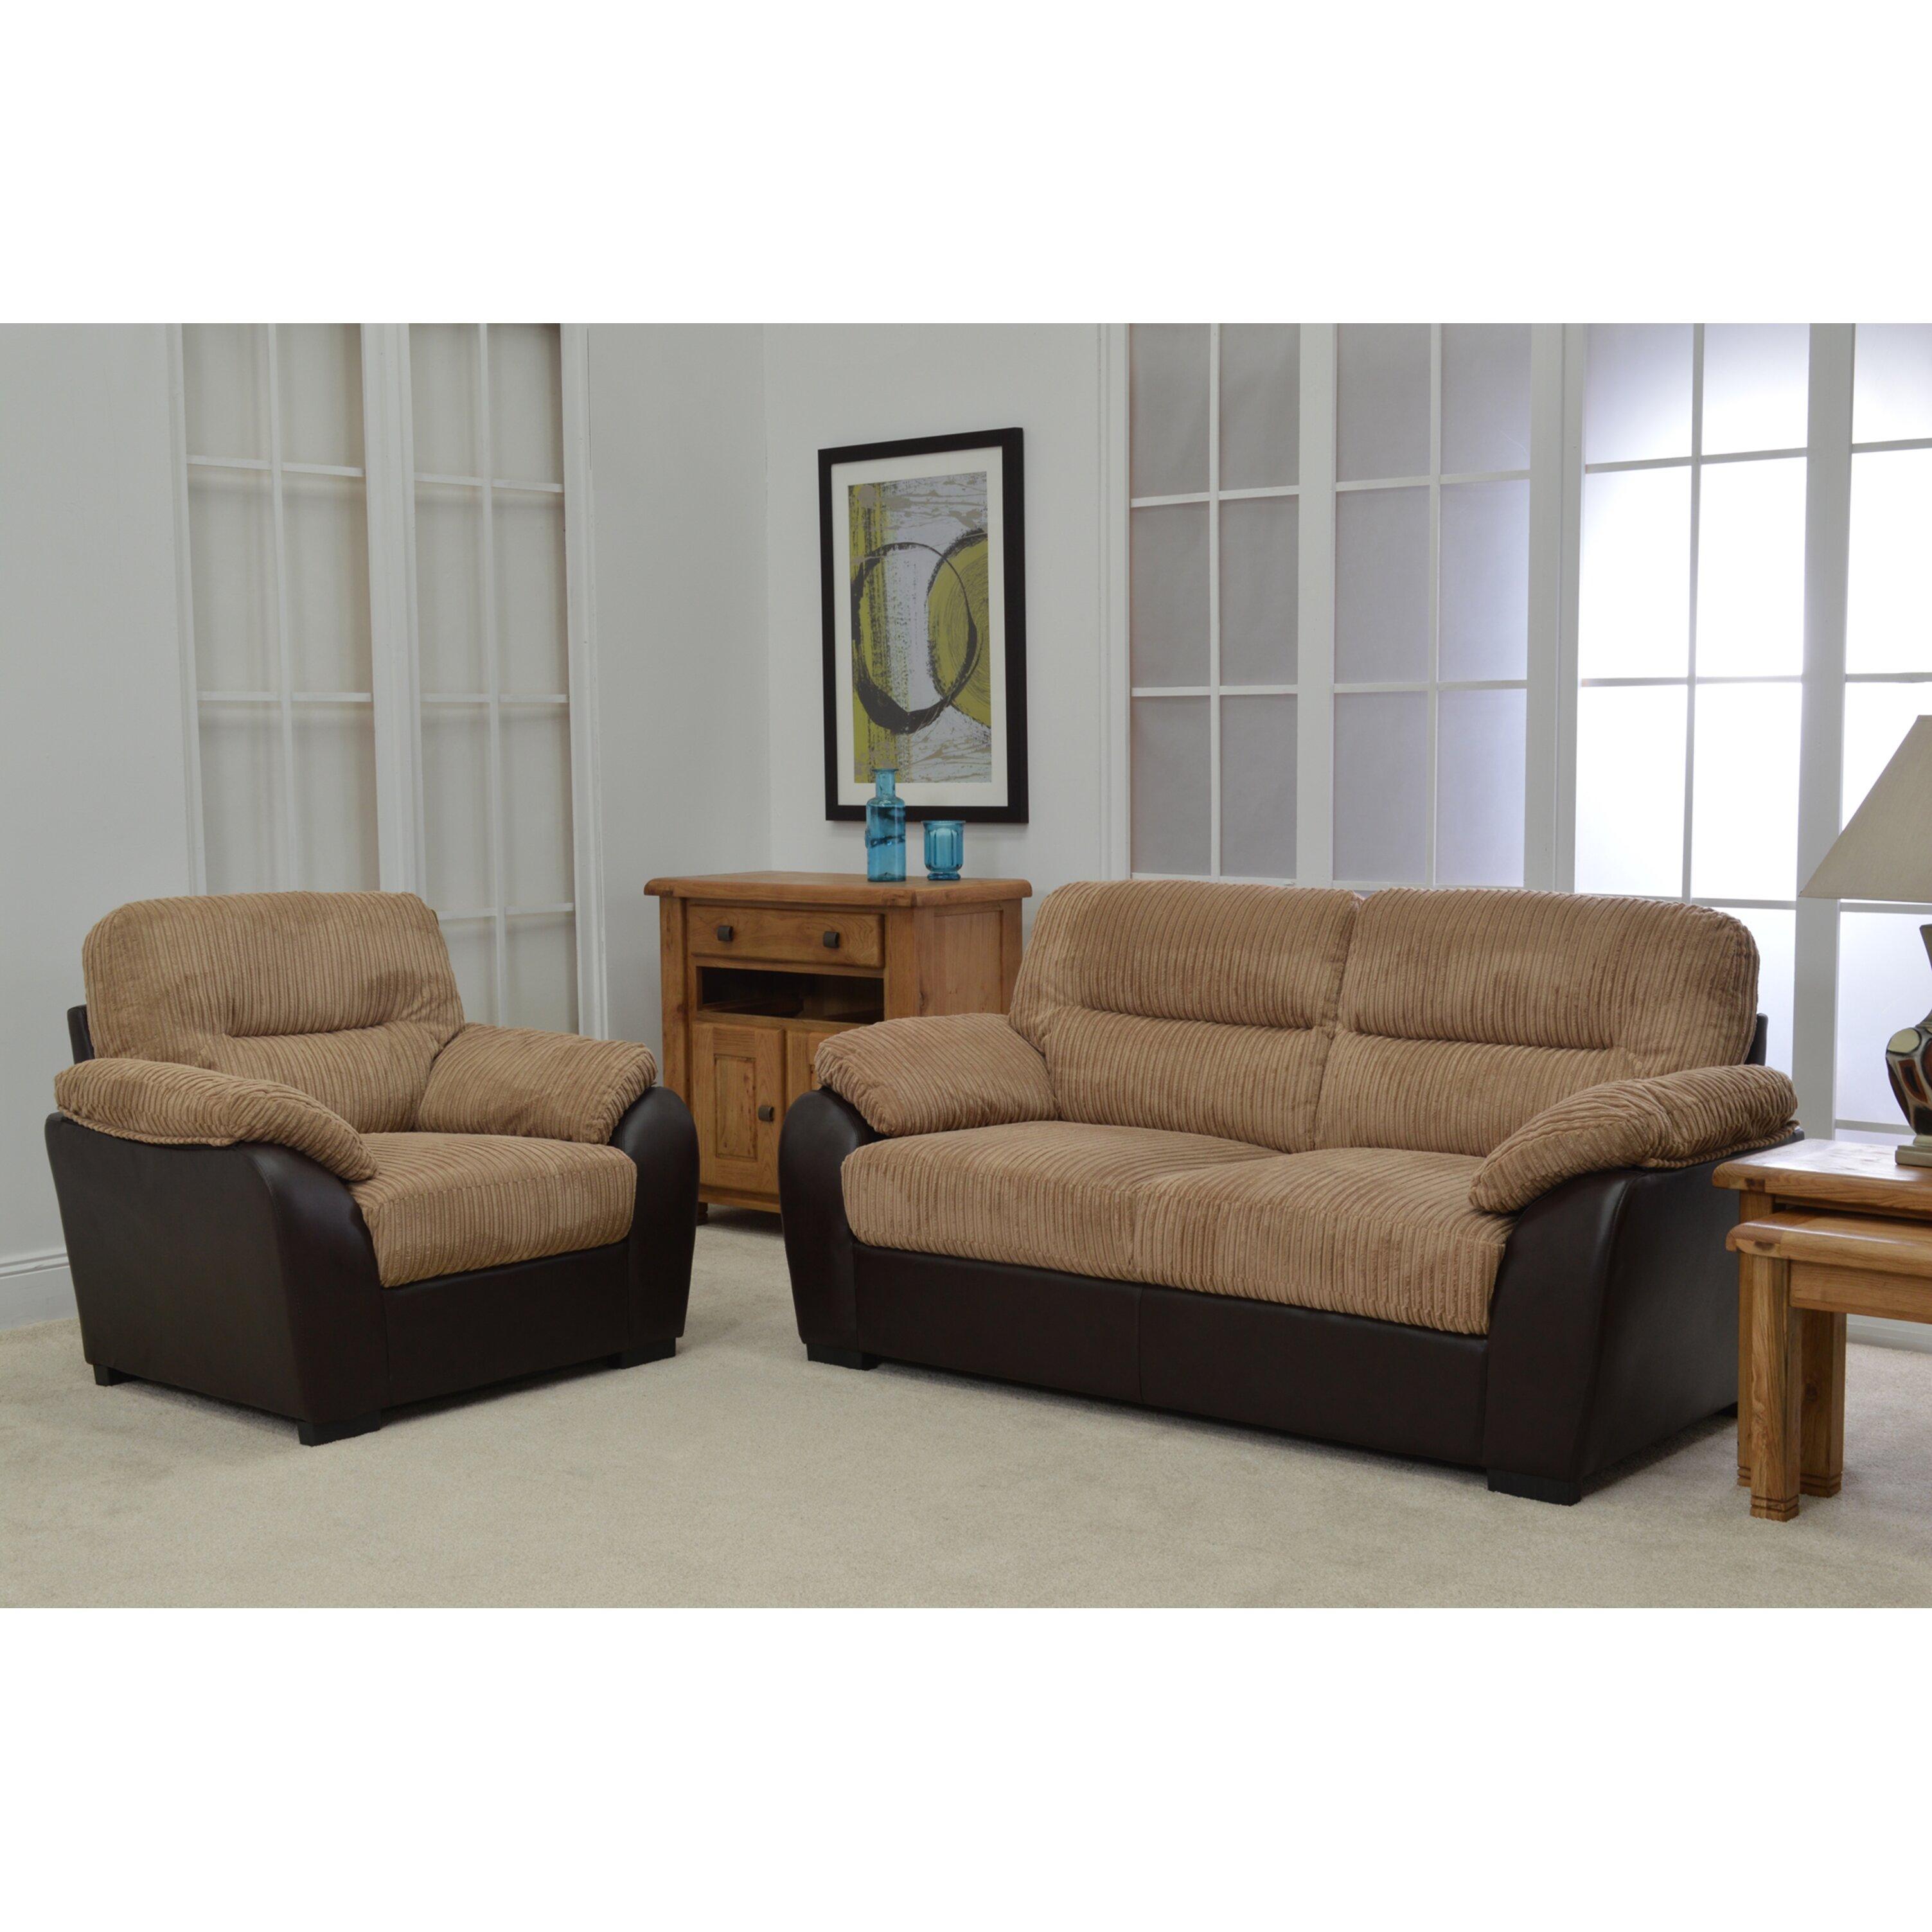 Homestead Living Hayes 3 Seater Sofa Reviews Wayfair Uk